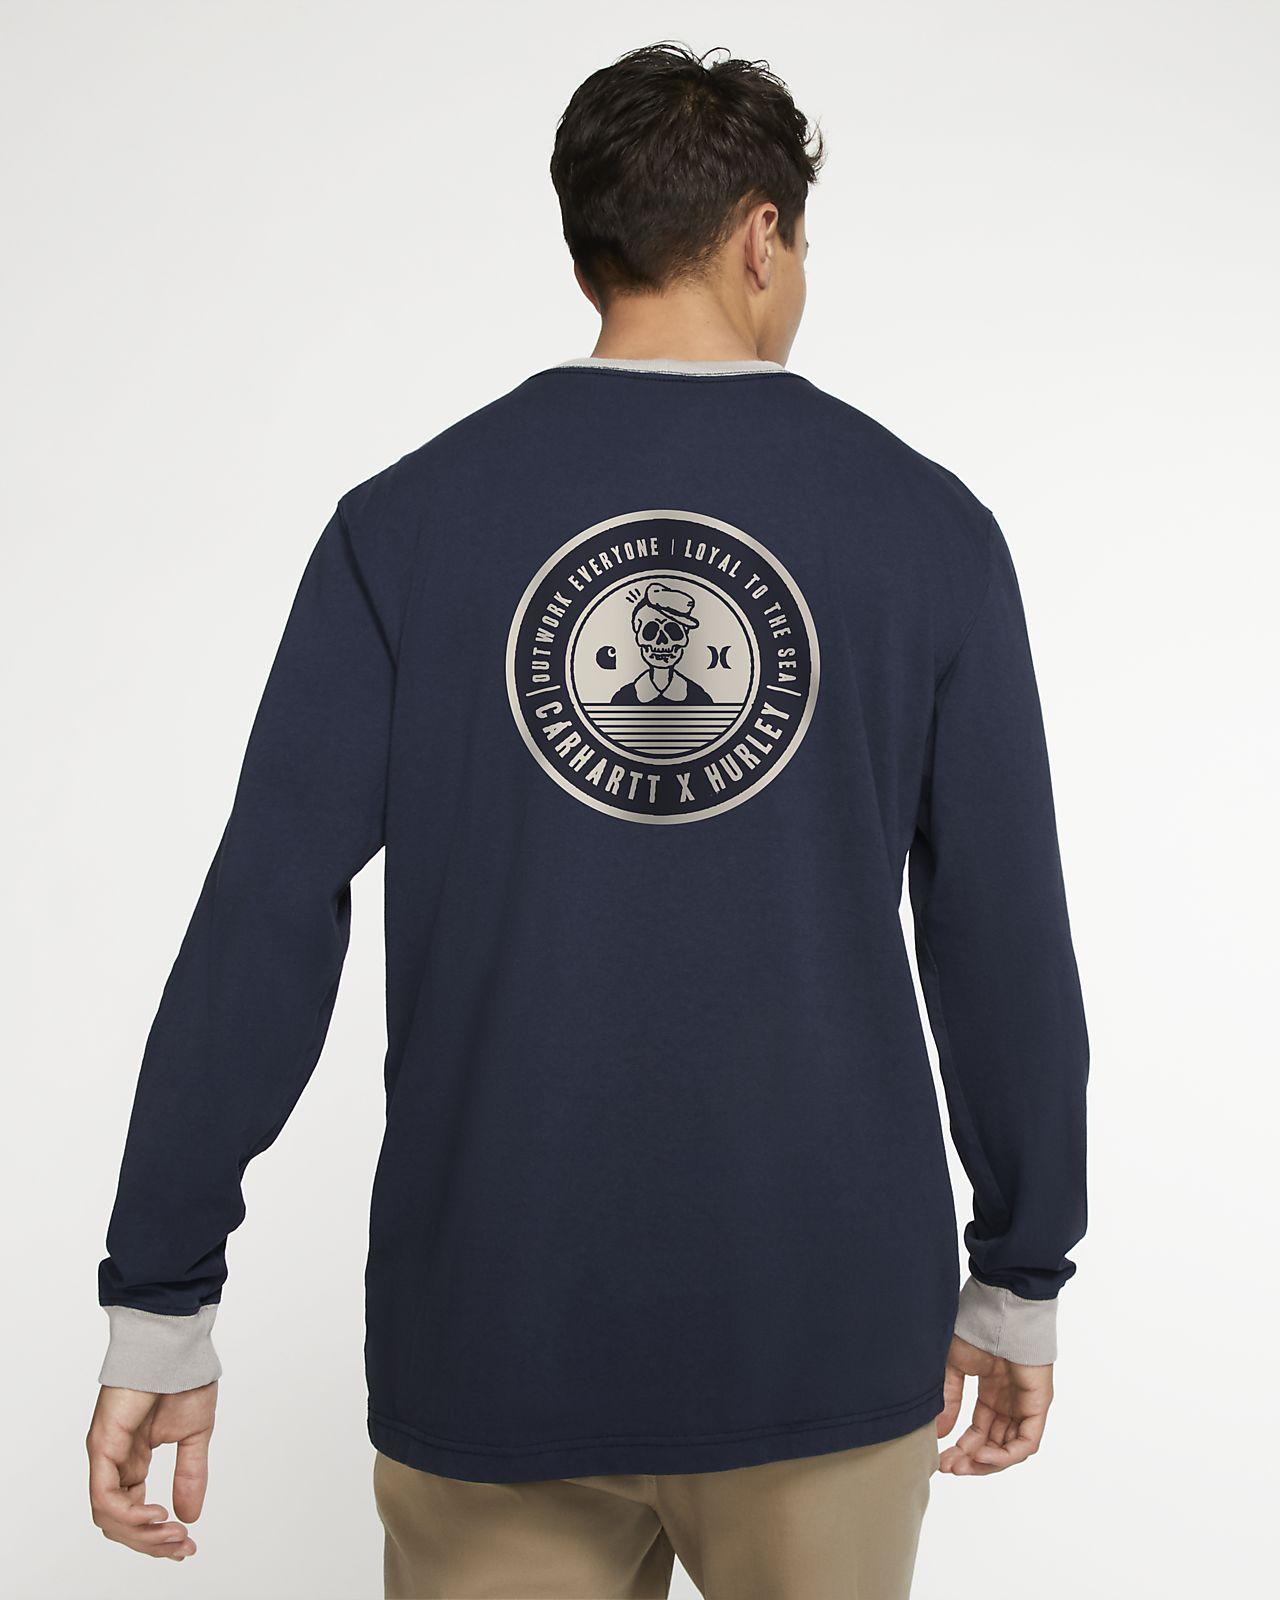 Hurley x Carhartt Ringer Langarm-T-Shirt für Herren